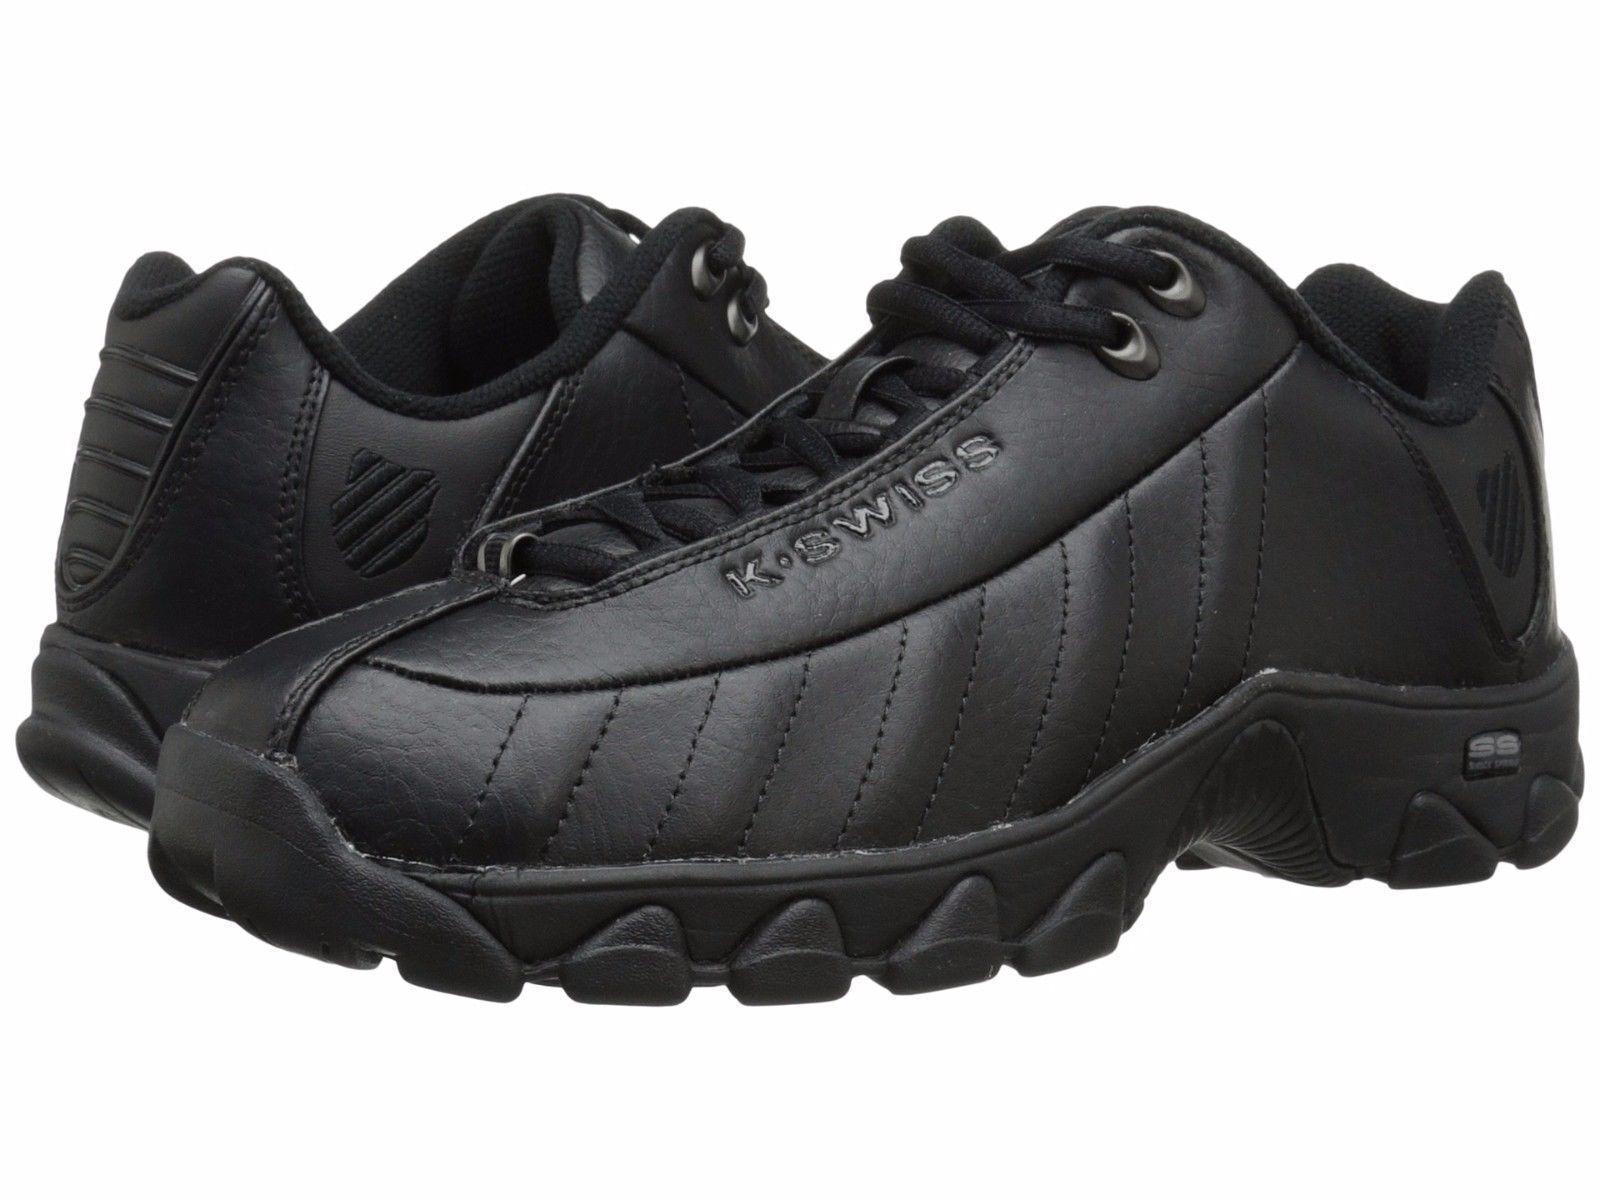 K Swiss Black Black Model ST329 Mens Fashion CMF Memory Foam Shoes Sizes 6